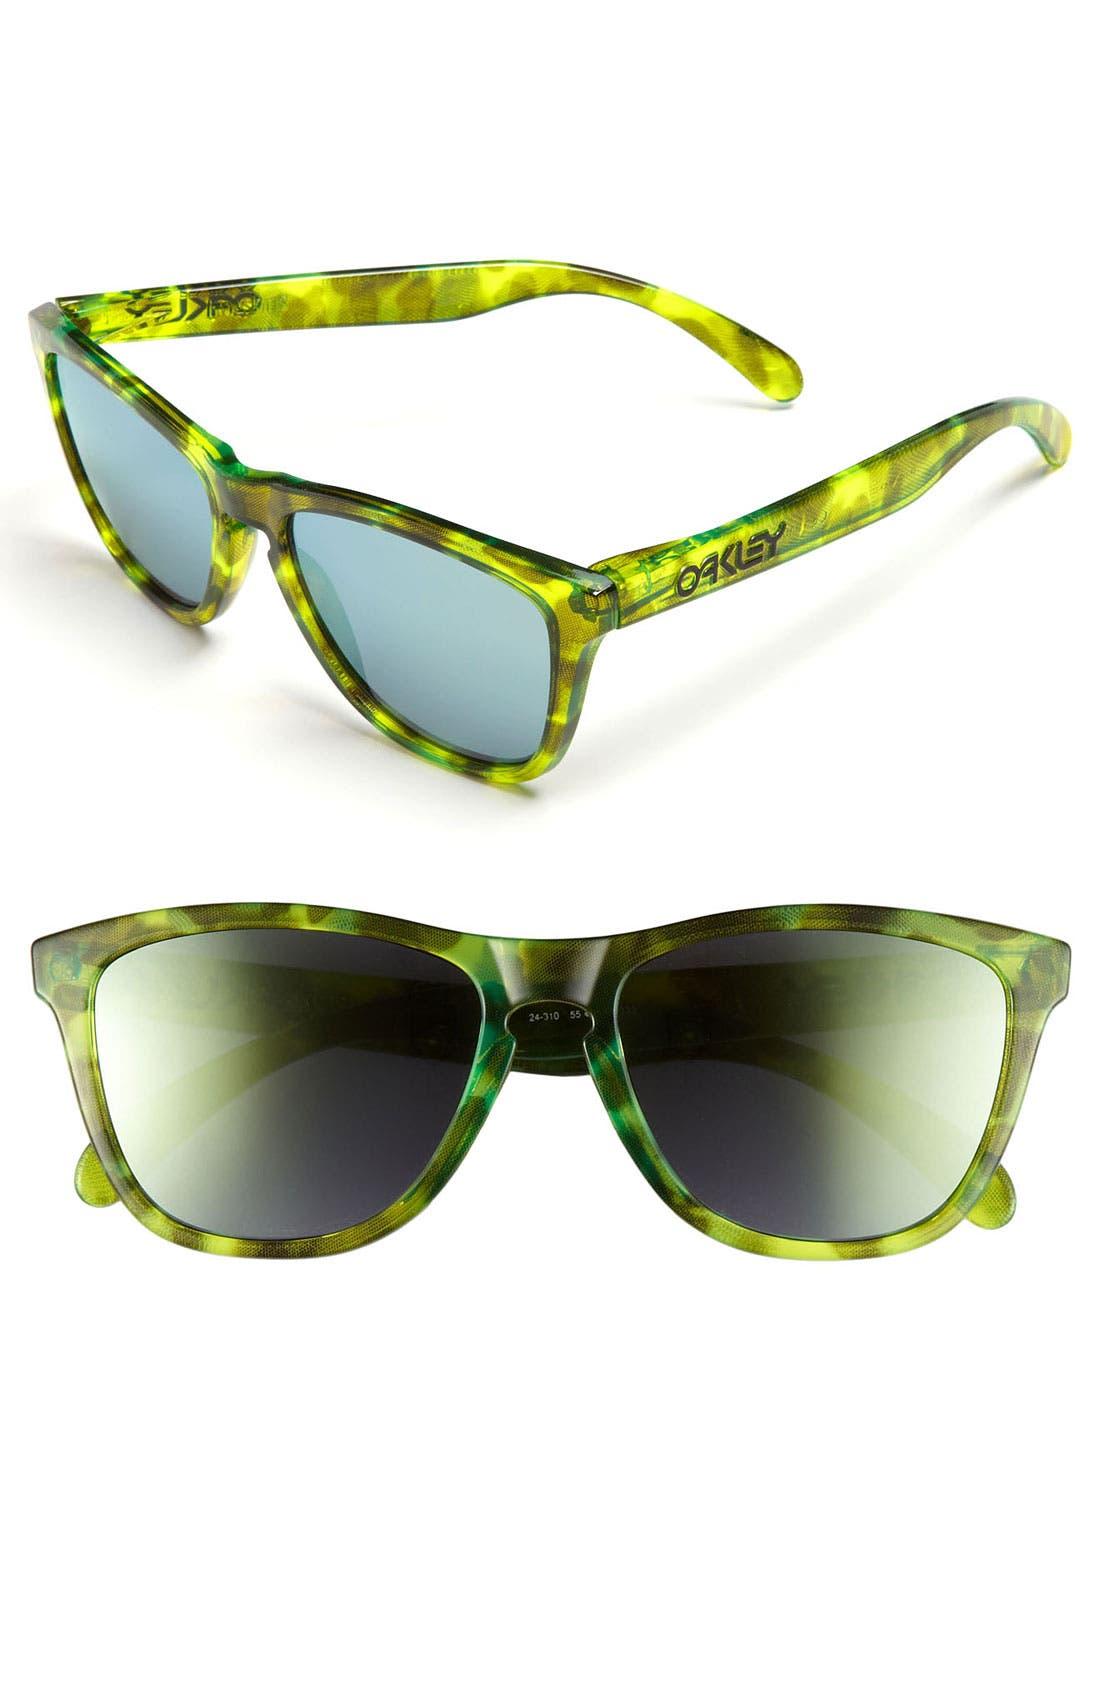 Alternate Image 1 Selected - Oakley 'RadarLock™' Edge' 155mm Sunglasses